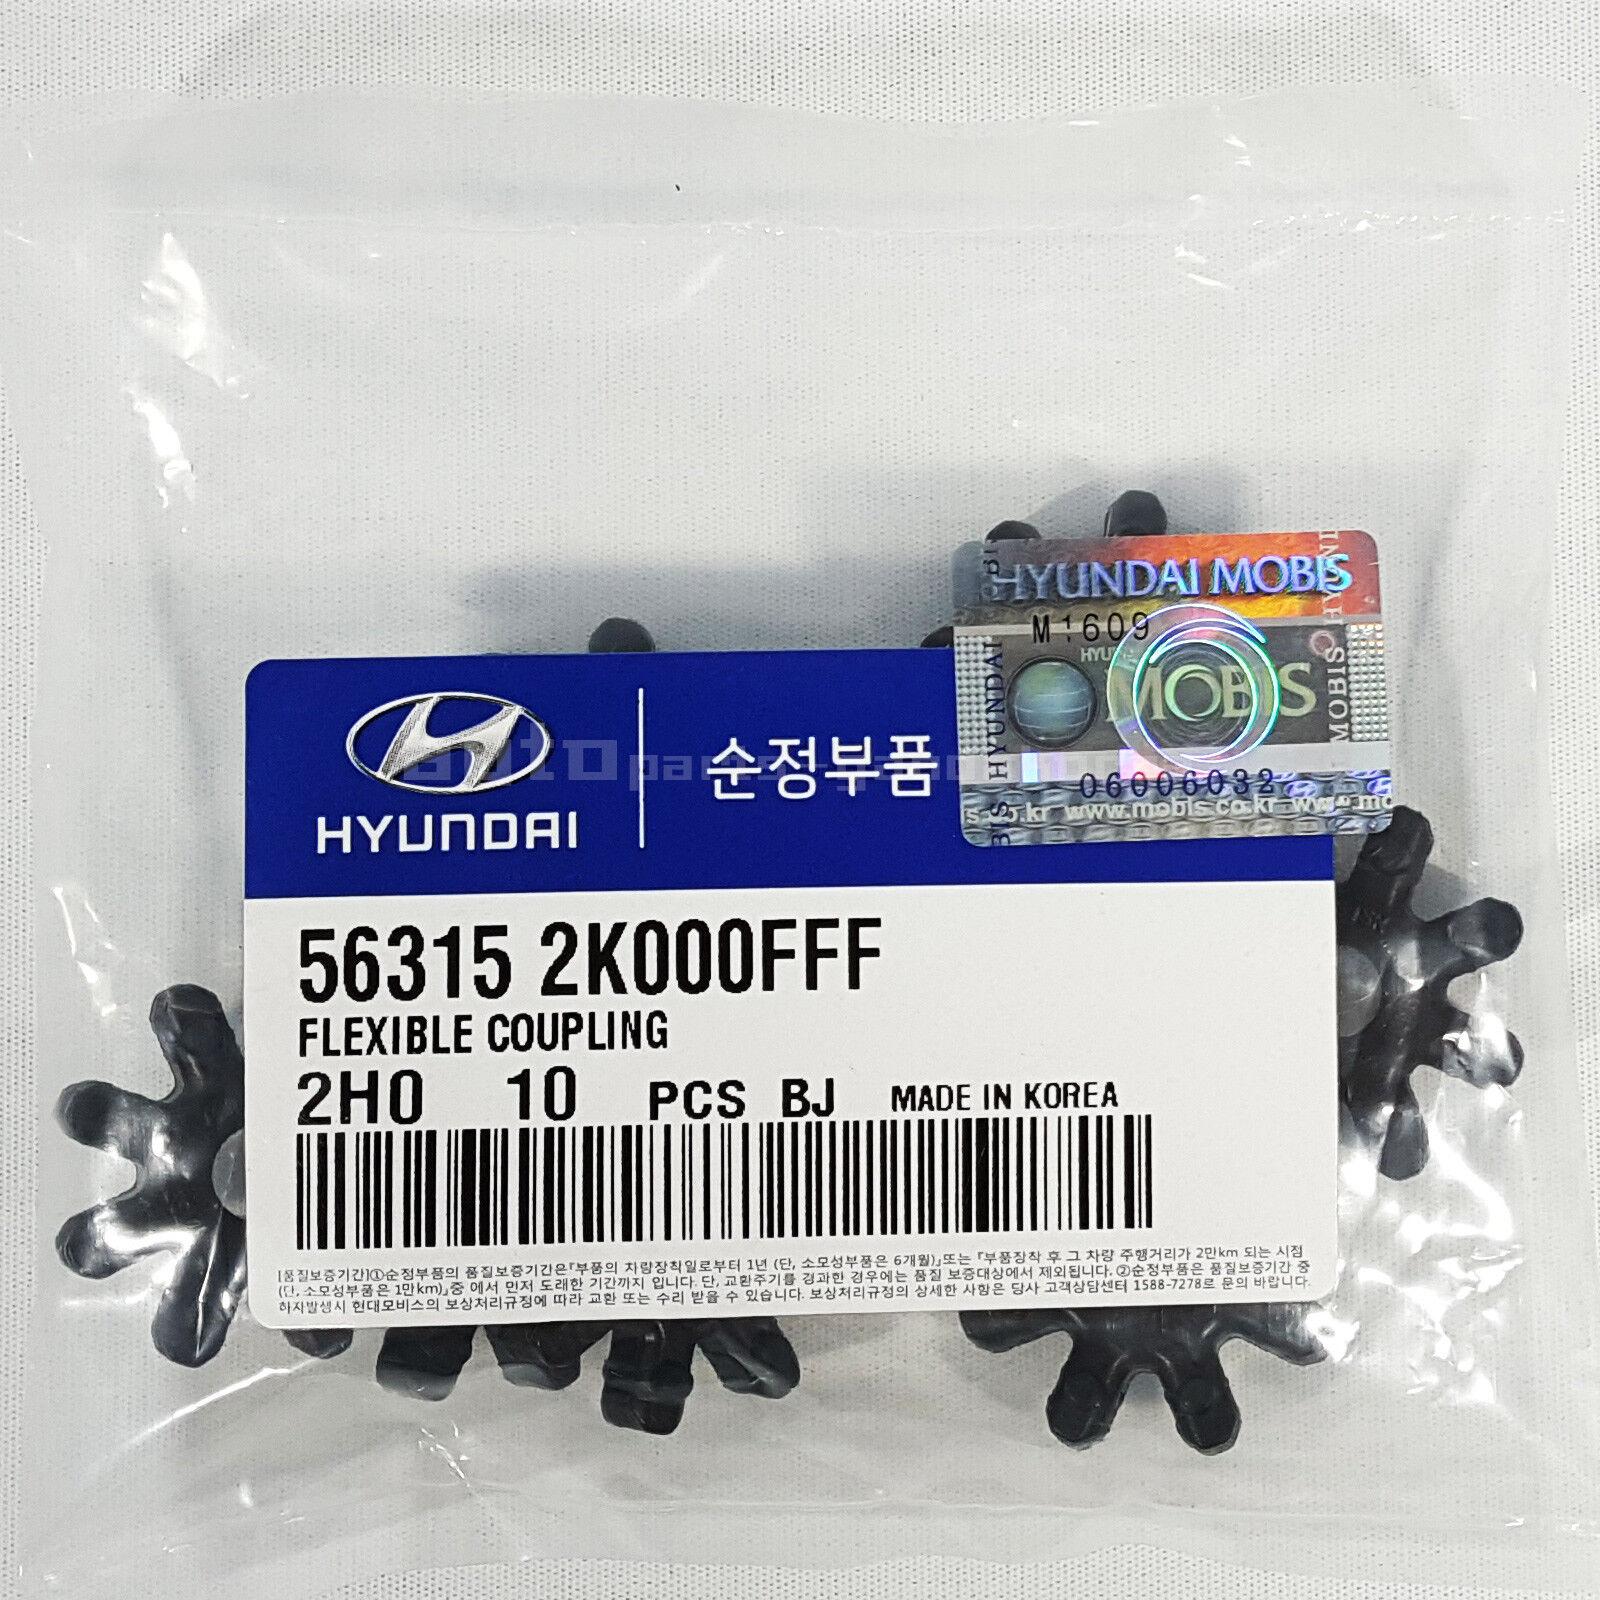 Genuine Flexible Coupling Steering Coupler 56315 2K000FFF 1pcs For Hyundai Kia